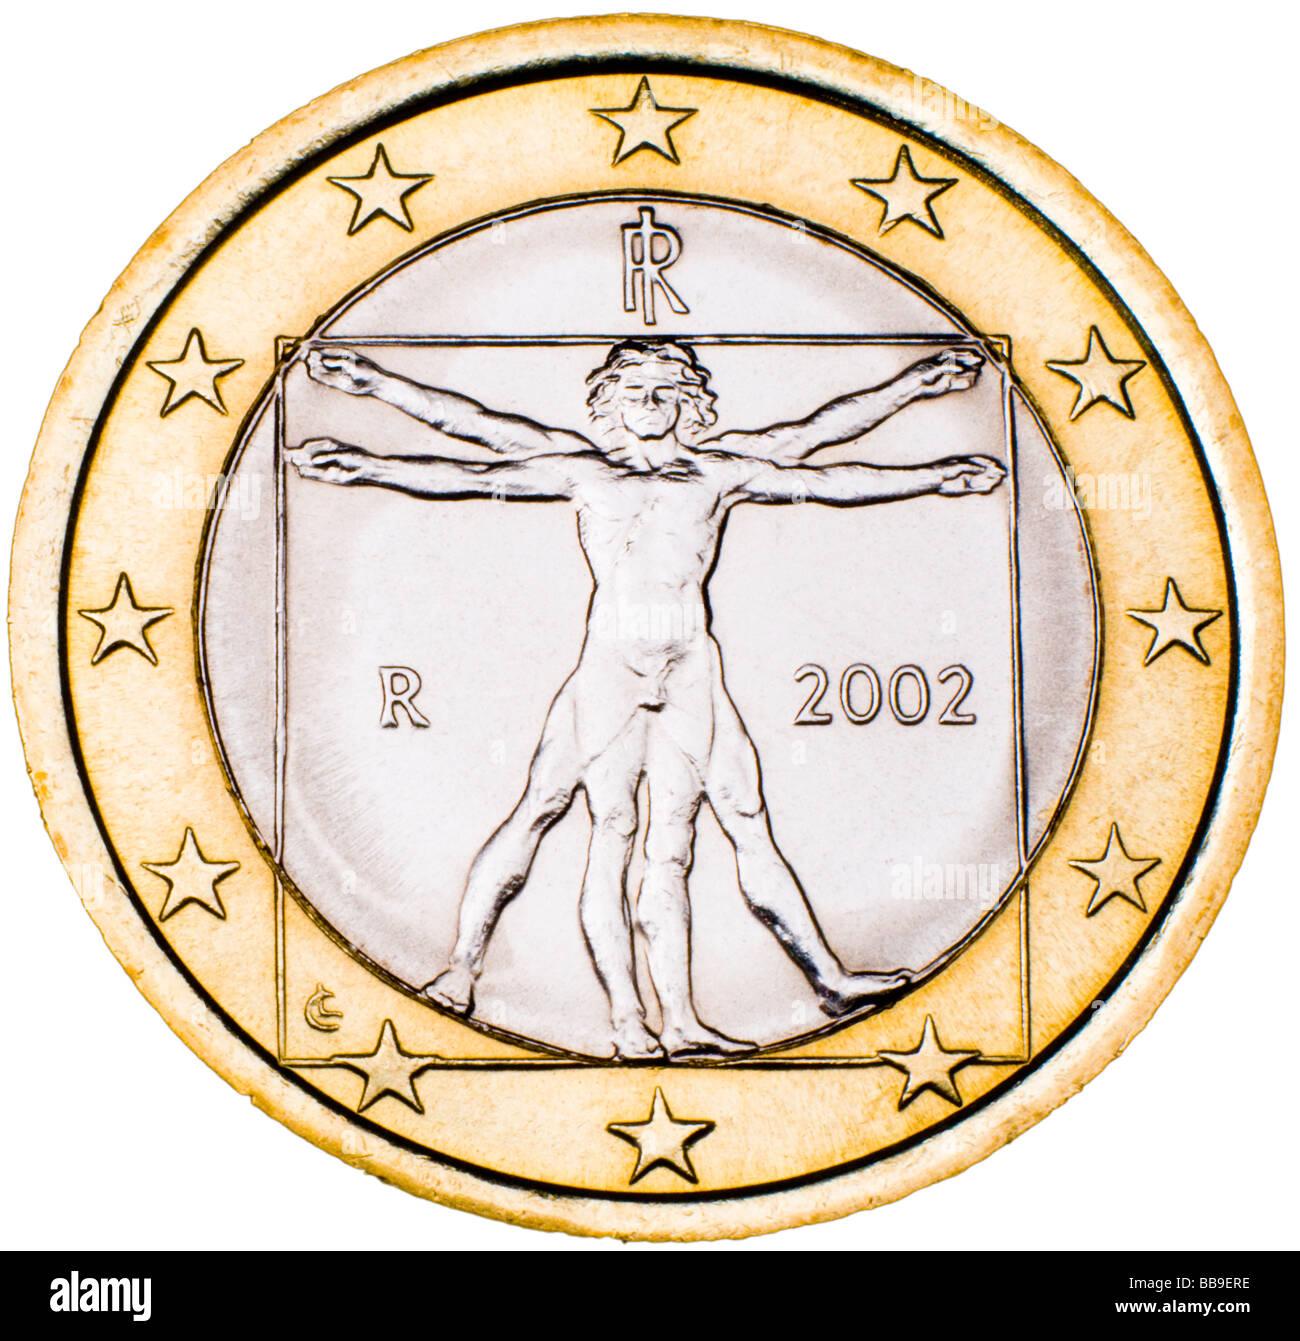 Italienischen 1 Euro Münze Rückseite Stockfoto Bild 24180786 Alamy